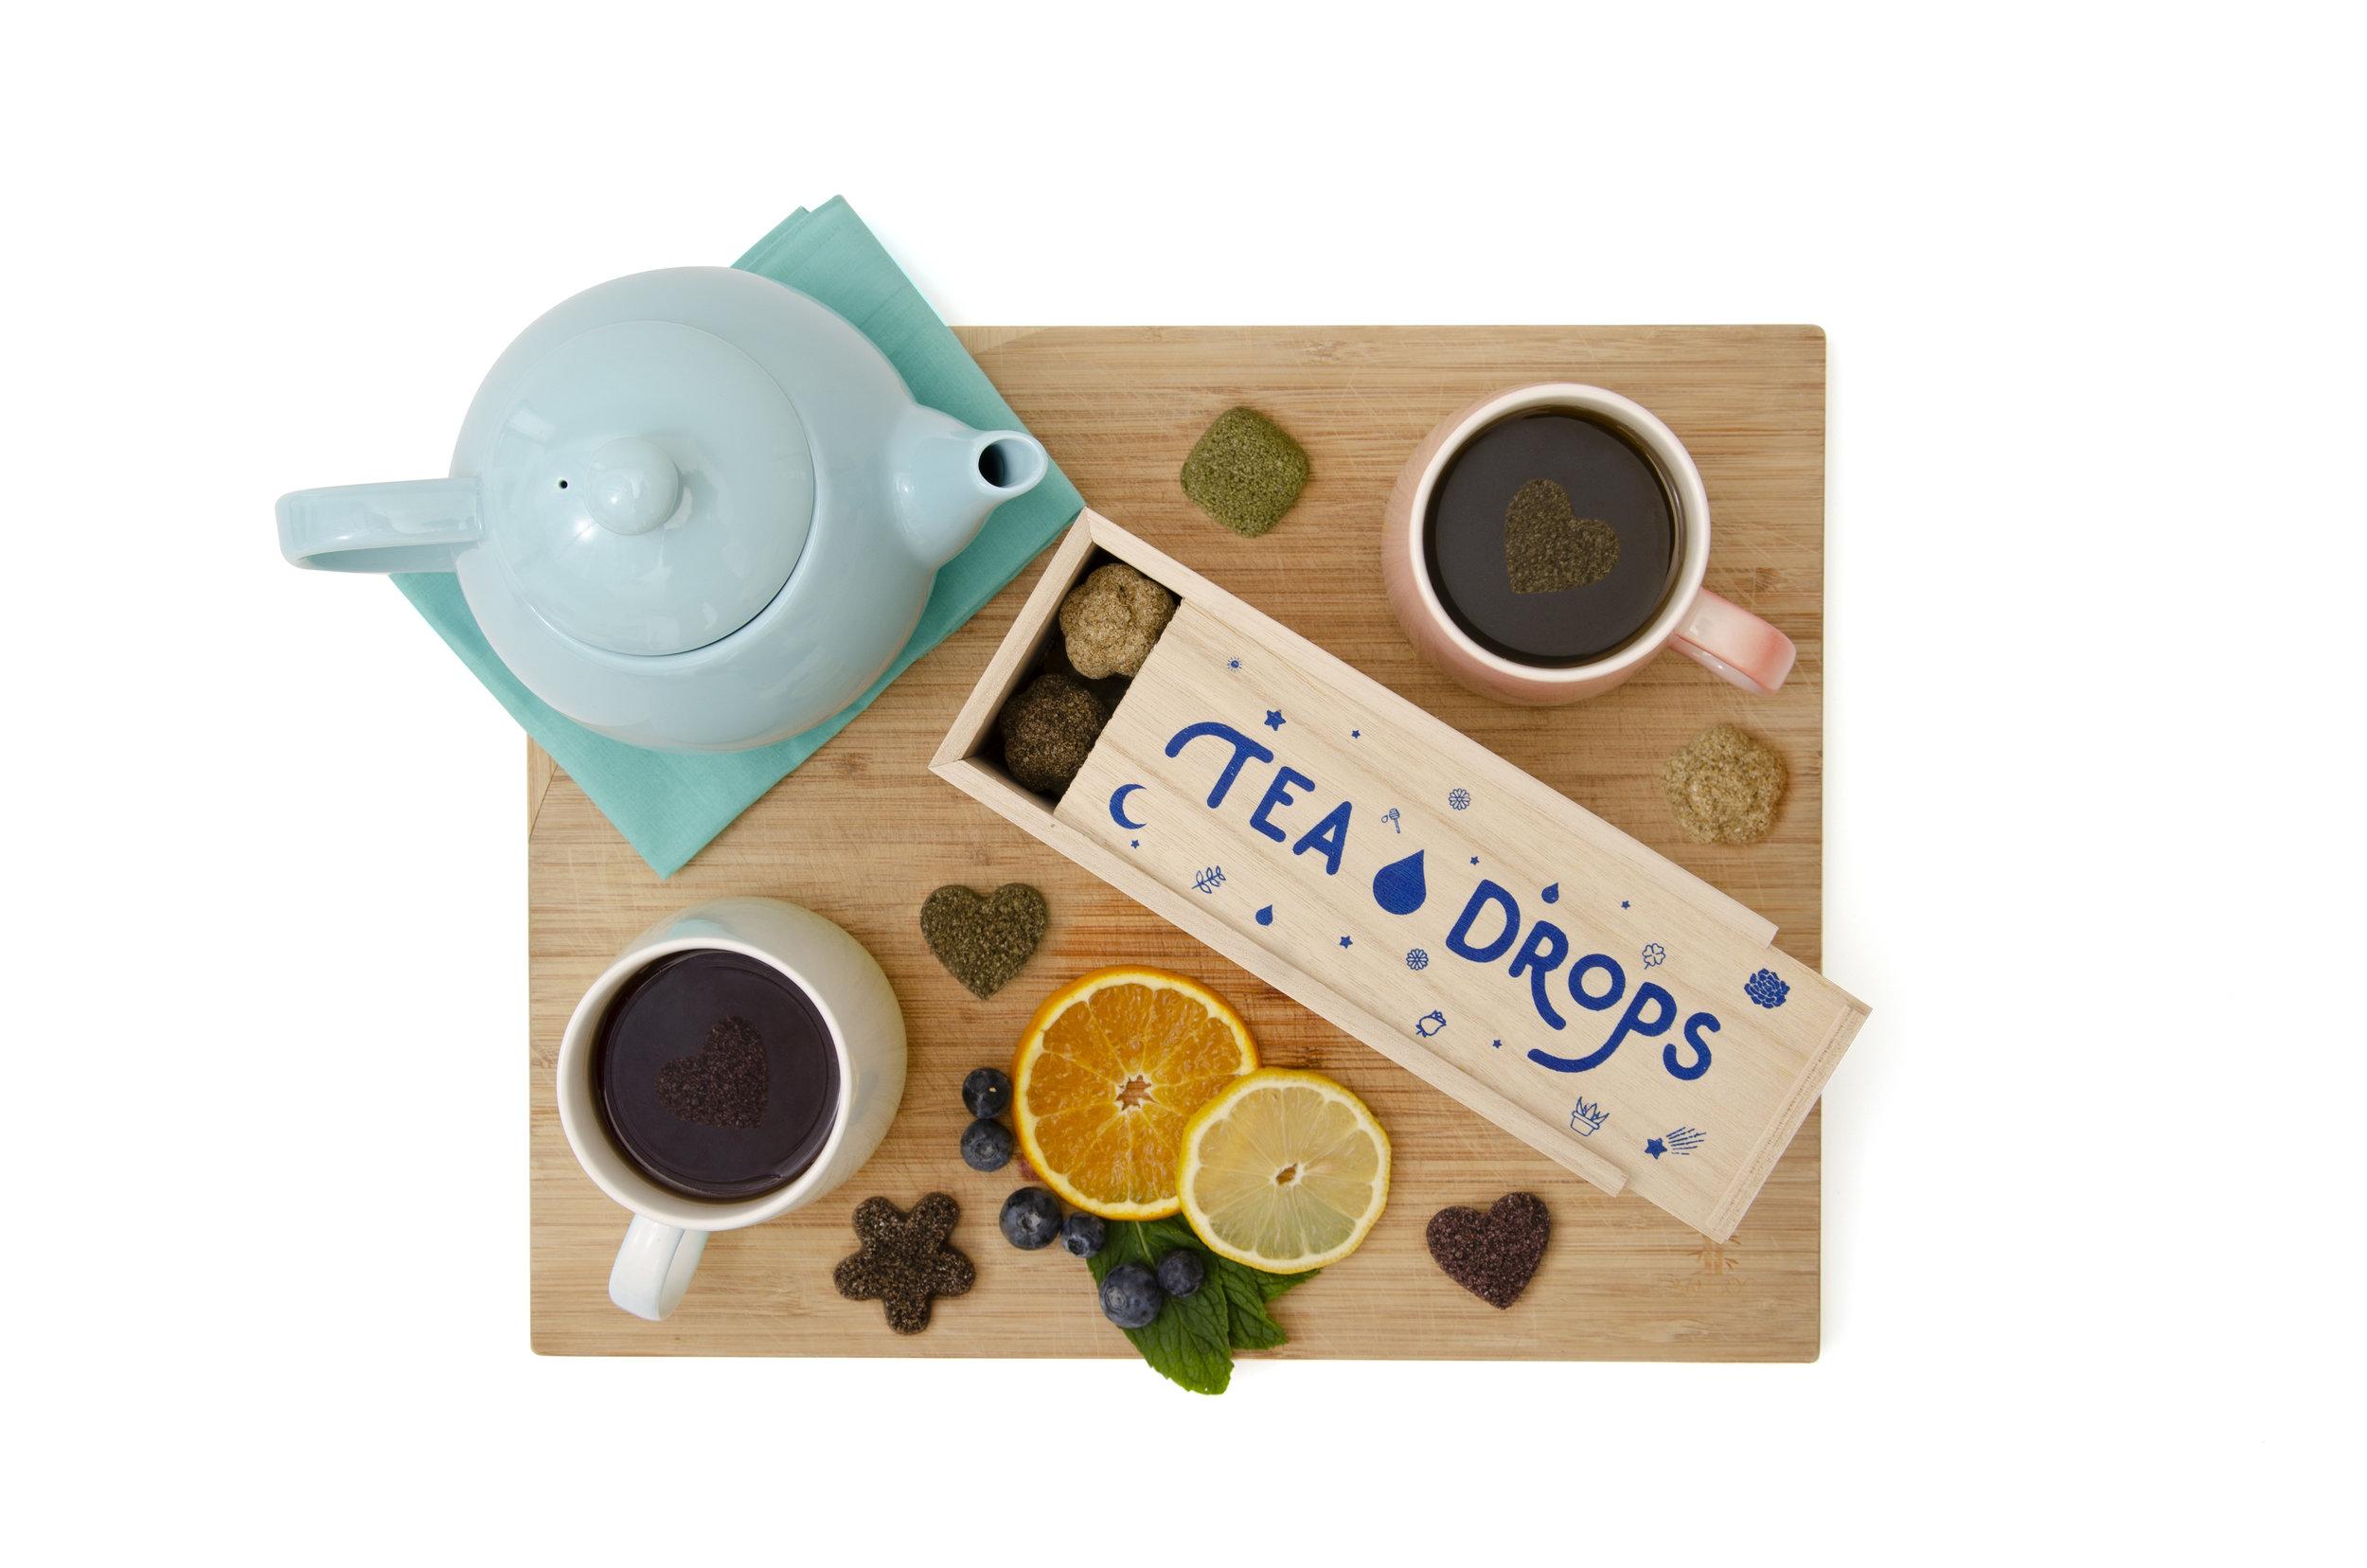 Sashee Chandran Tea Drops MAIA community black friday justyna kedra we rule werule